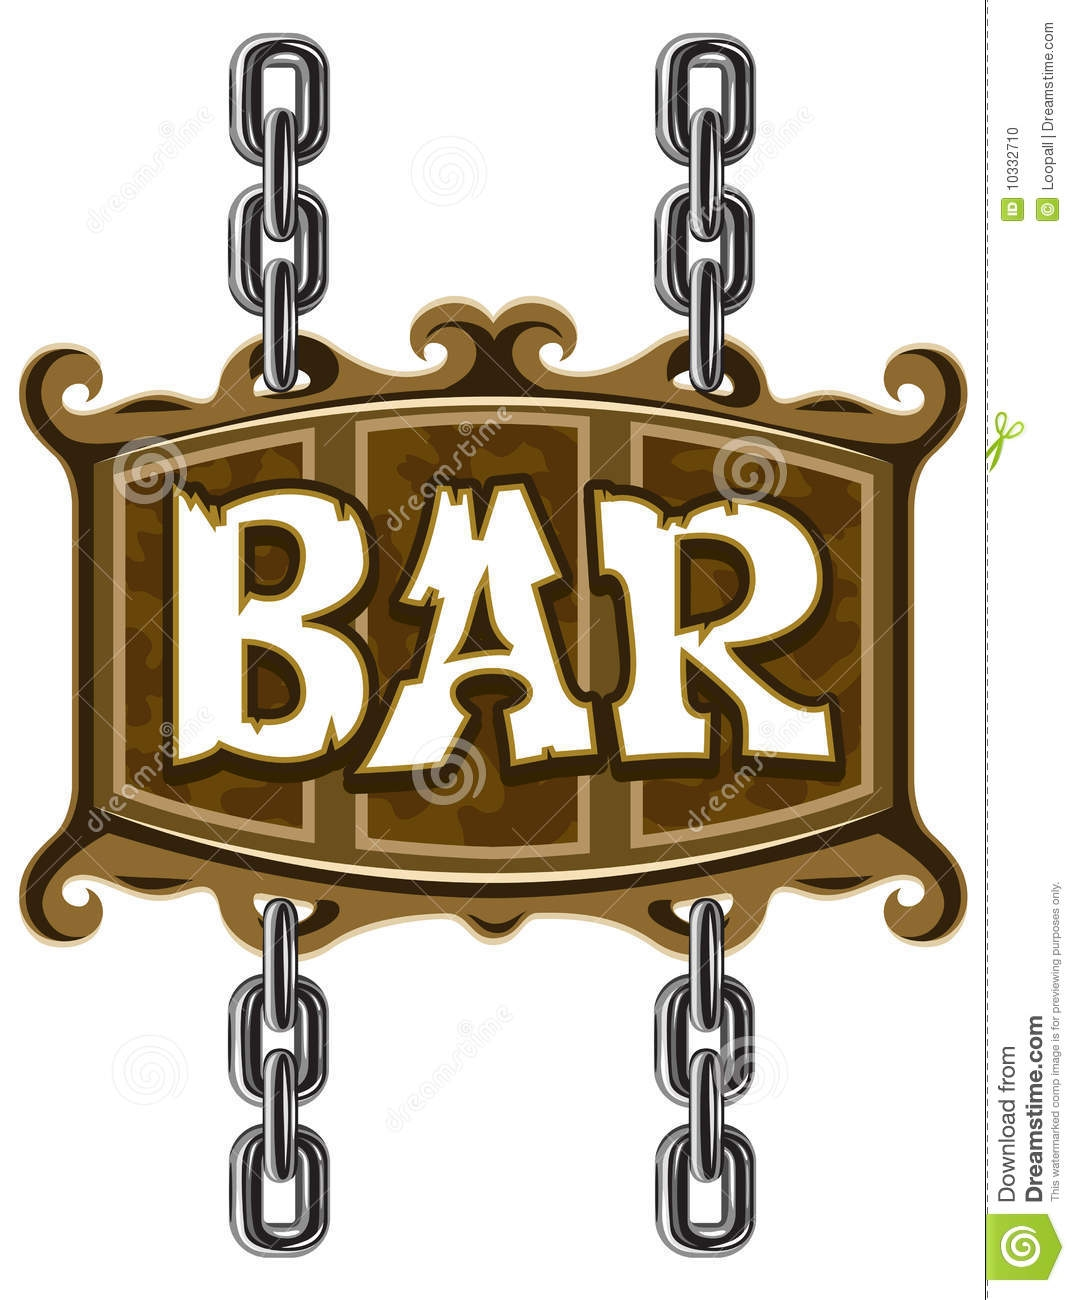 Awesome design digital collection. Bar clipart pub bar